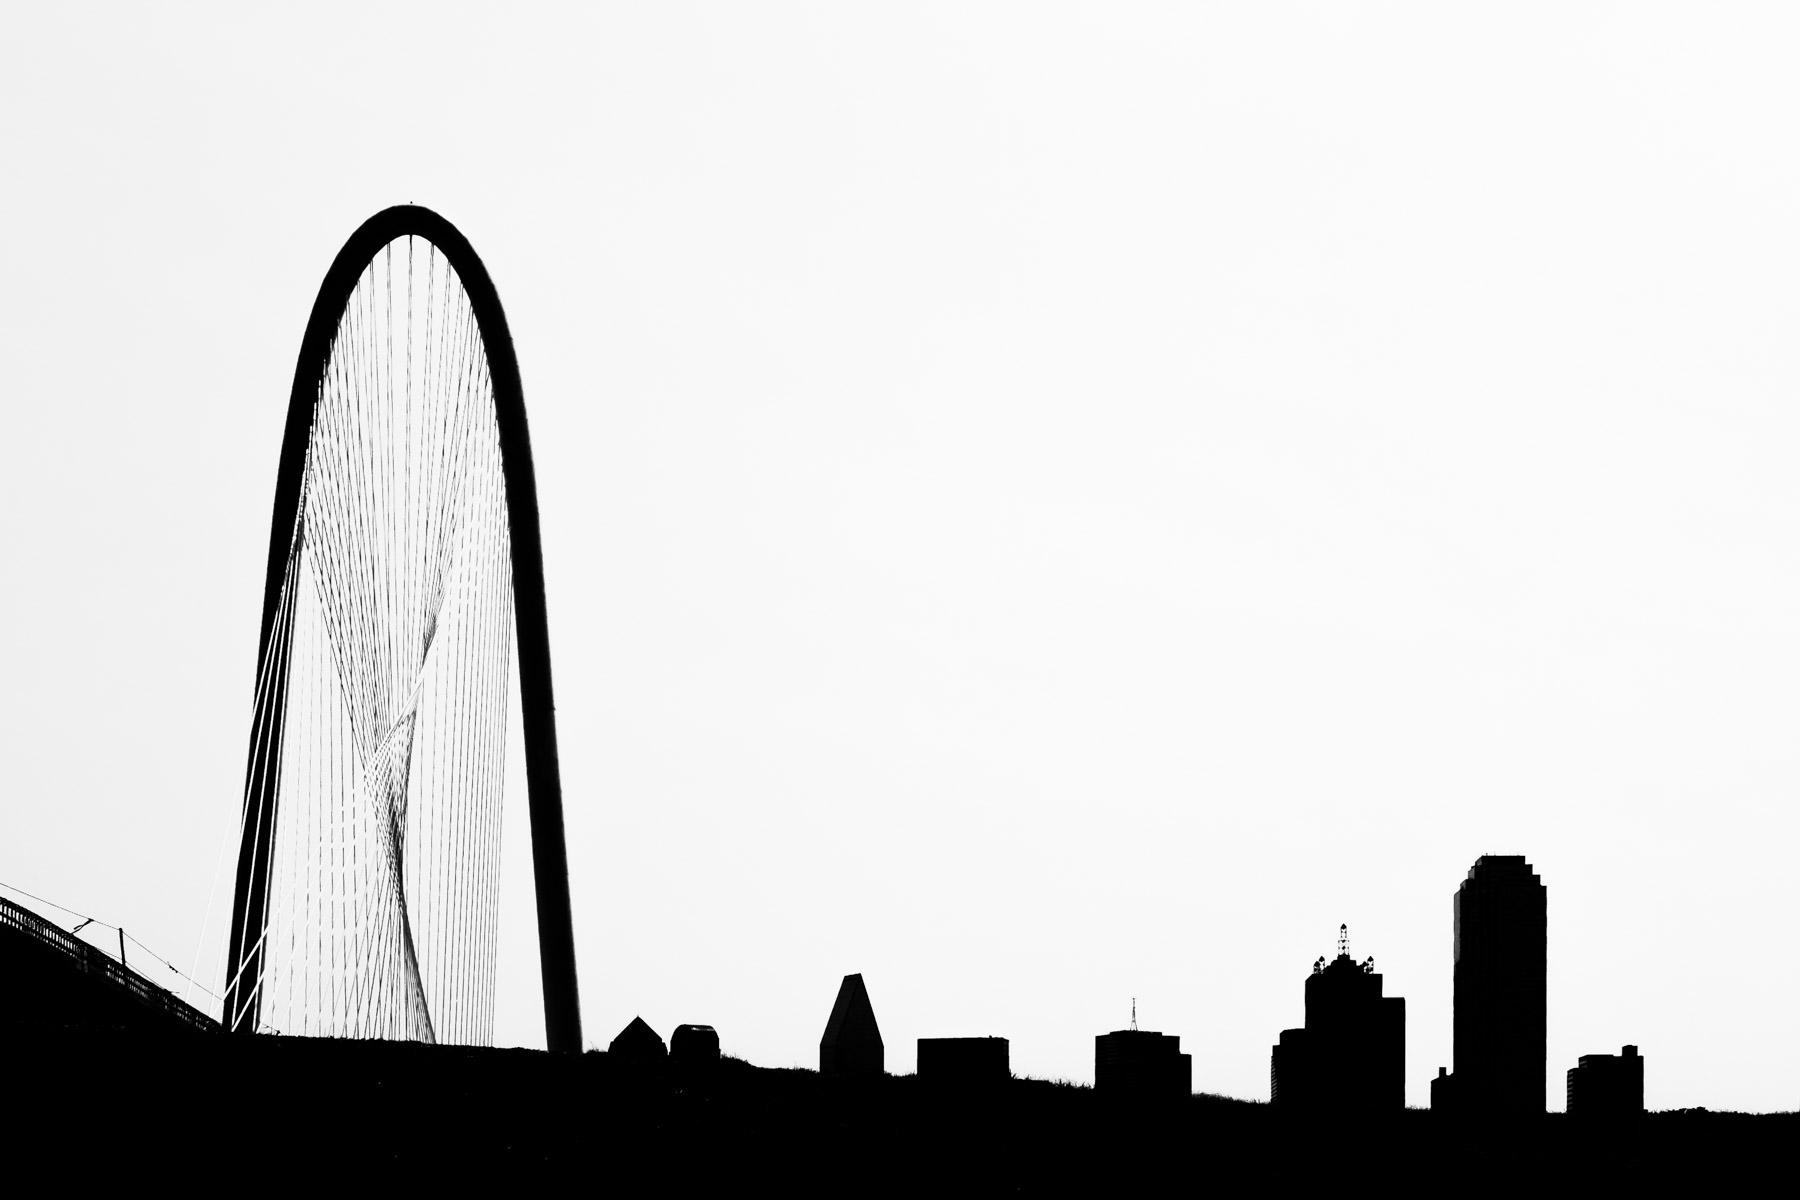 1800x1200 The Bridge And The City Dallas Fort Worth